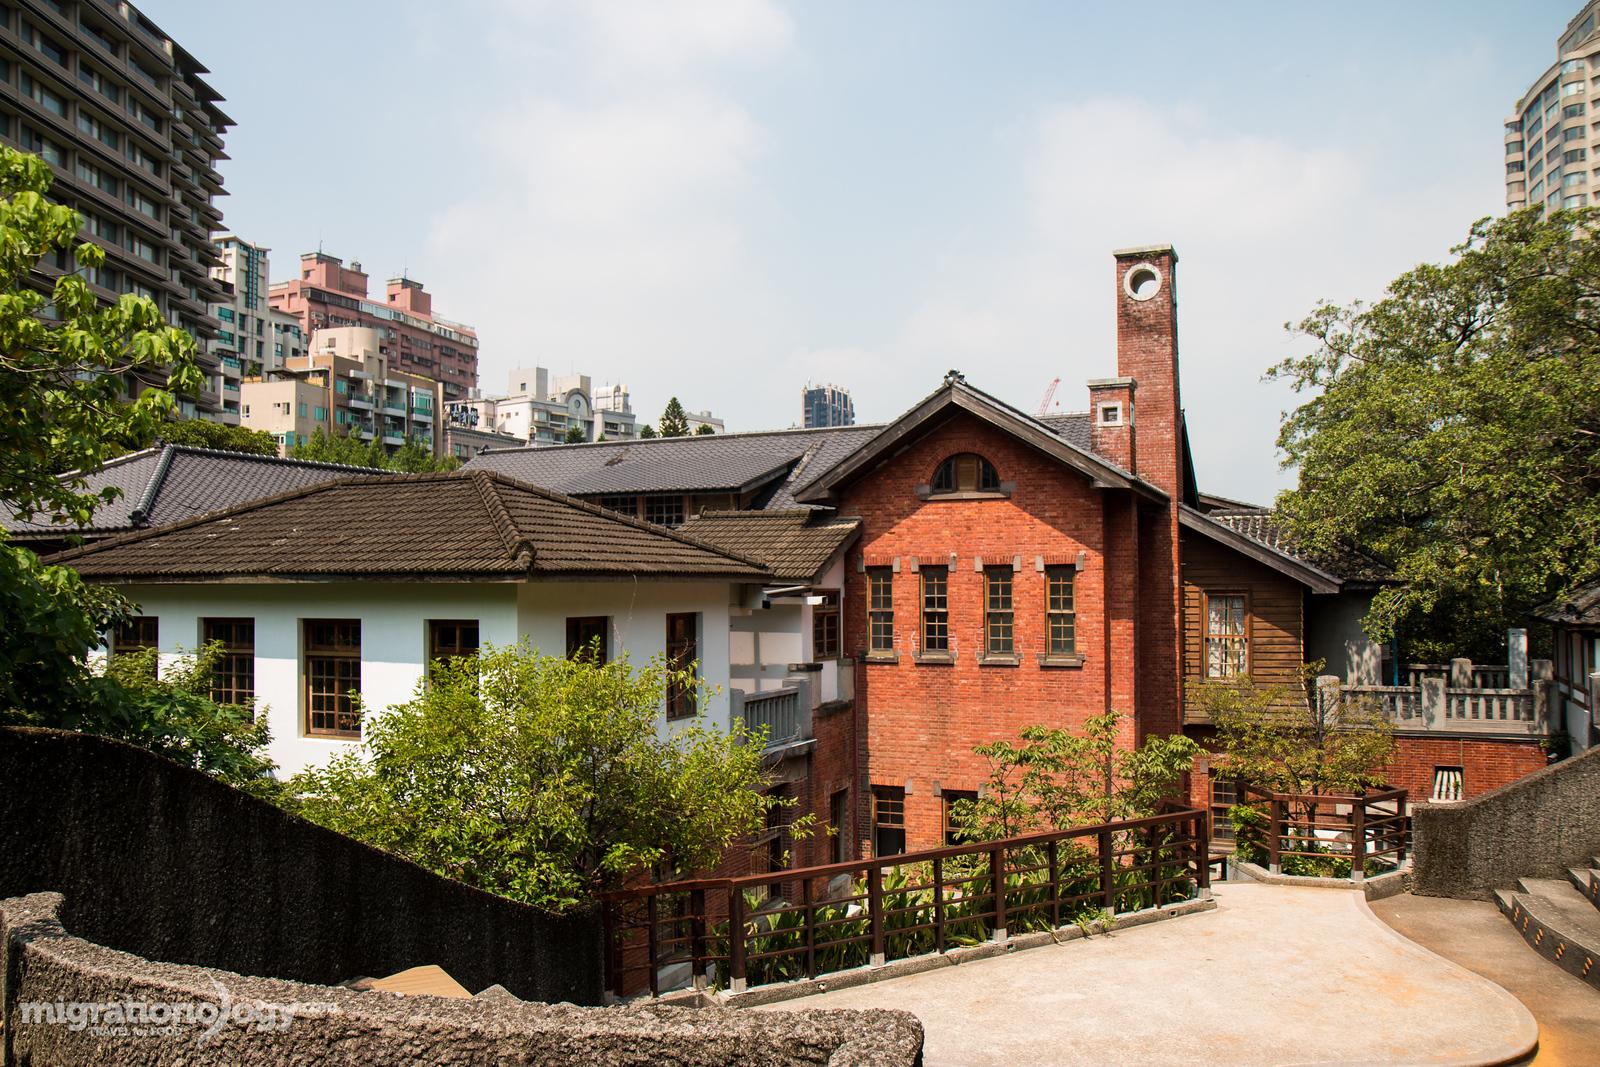 Beitou Hot Springs Museum